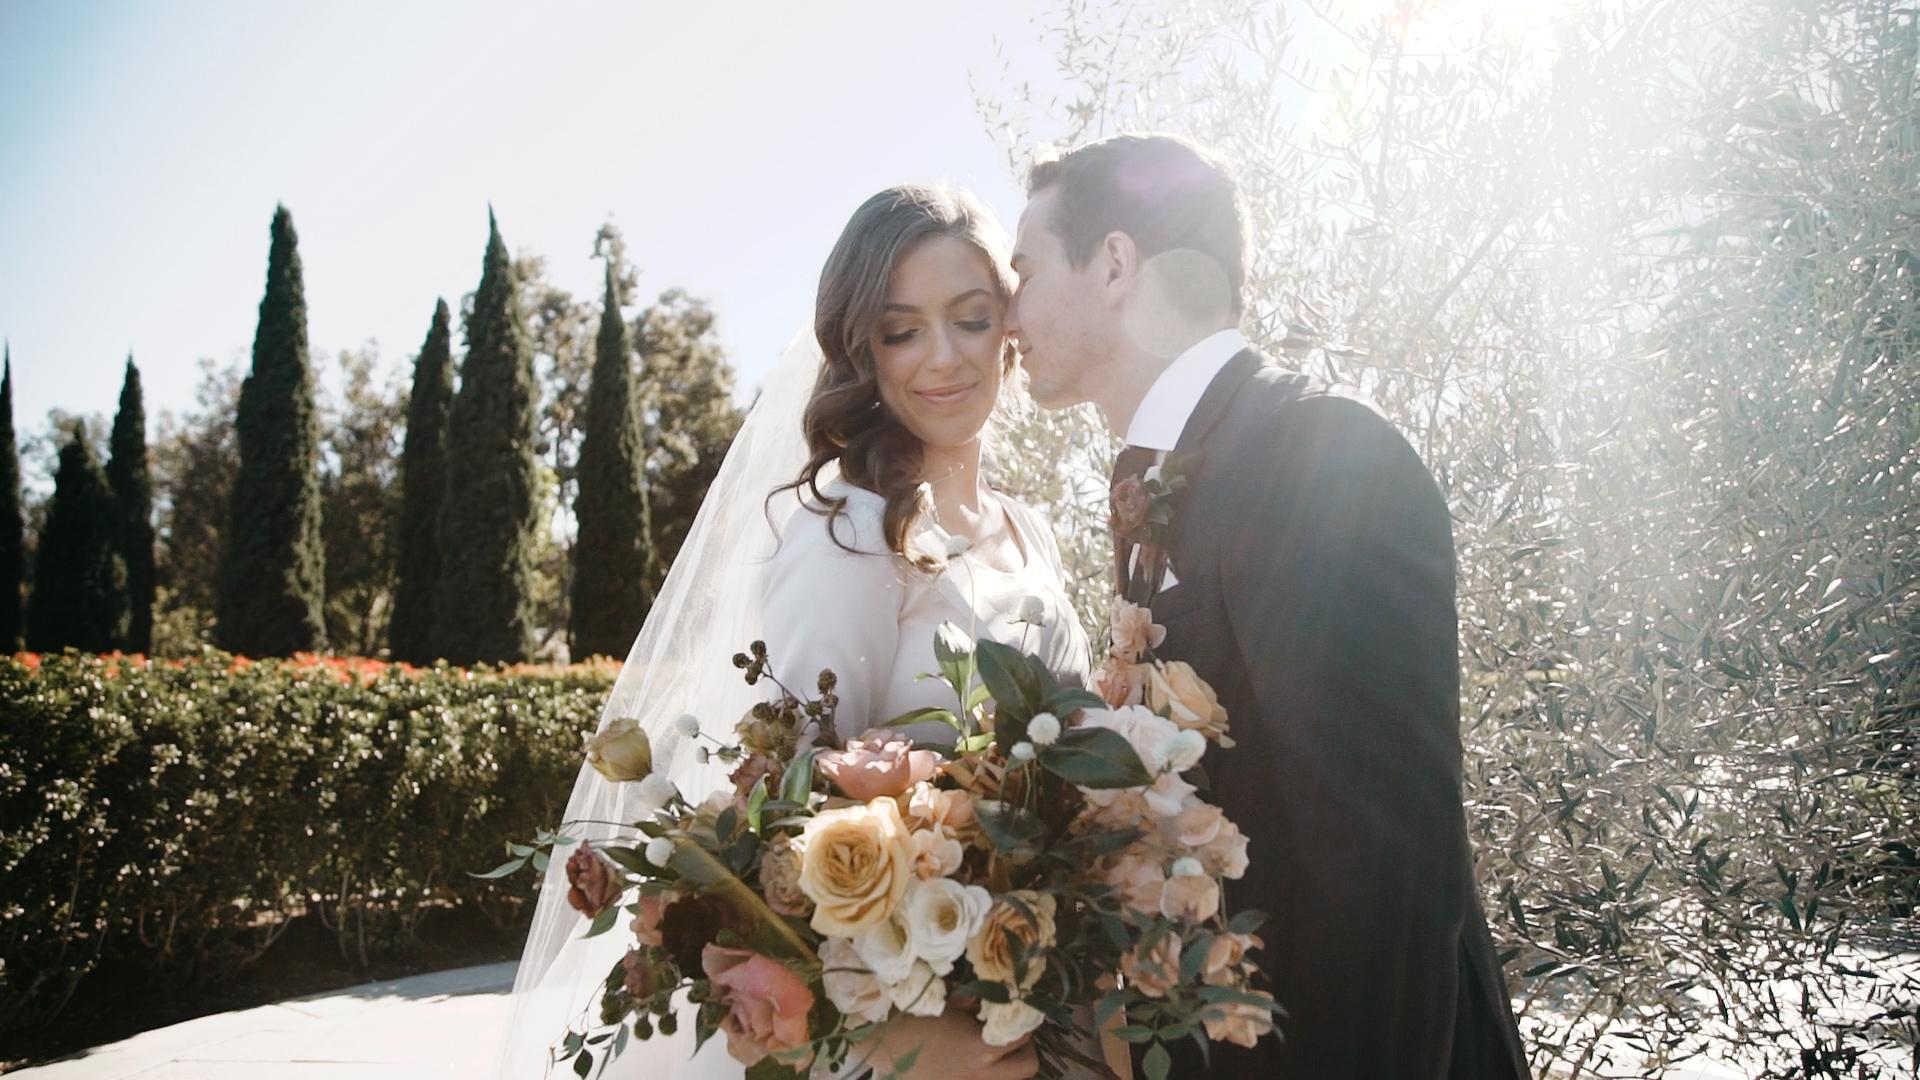 Dalton + Brooke | San Juan Capistrano, California | Franciscan Gardens